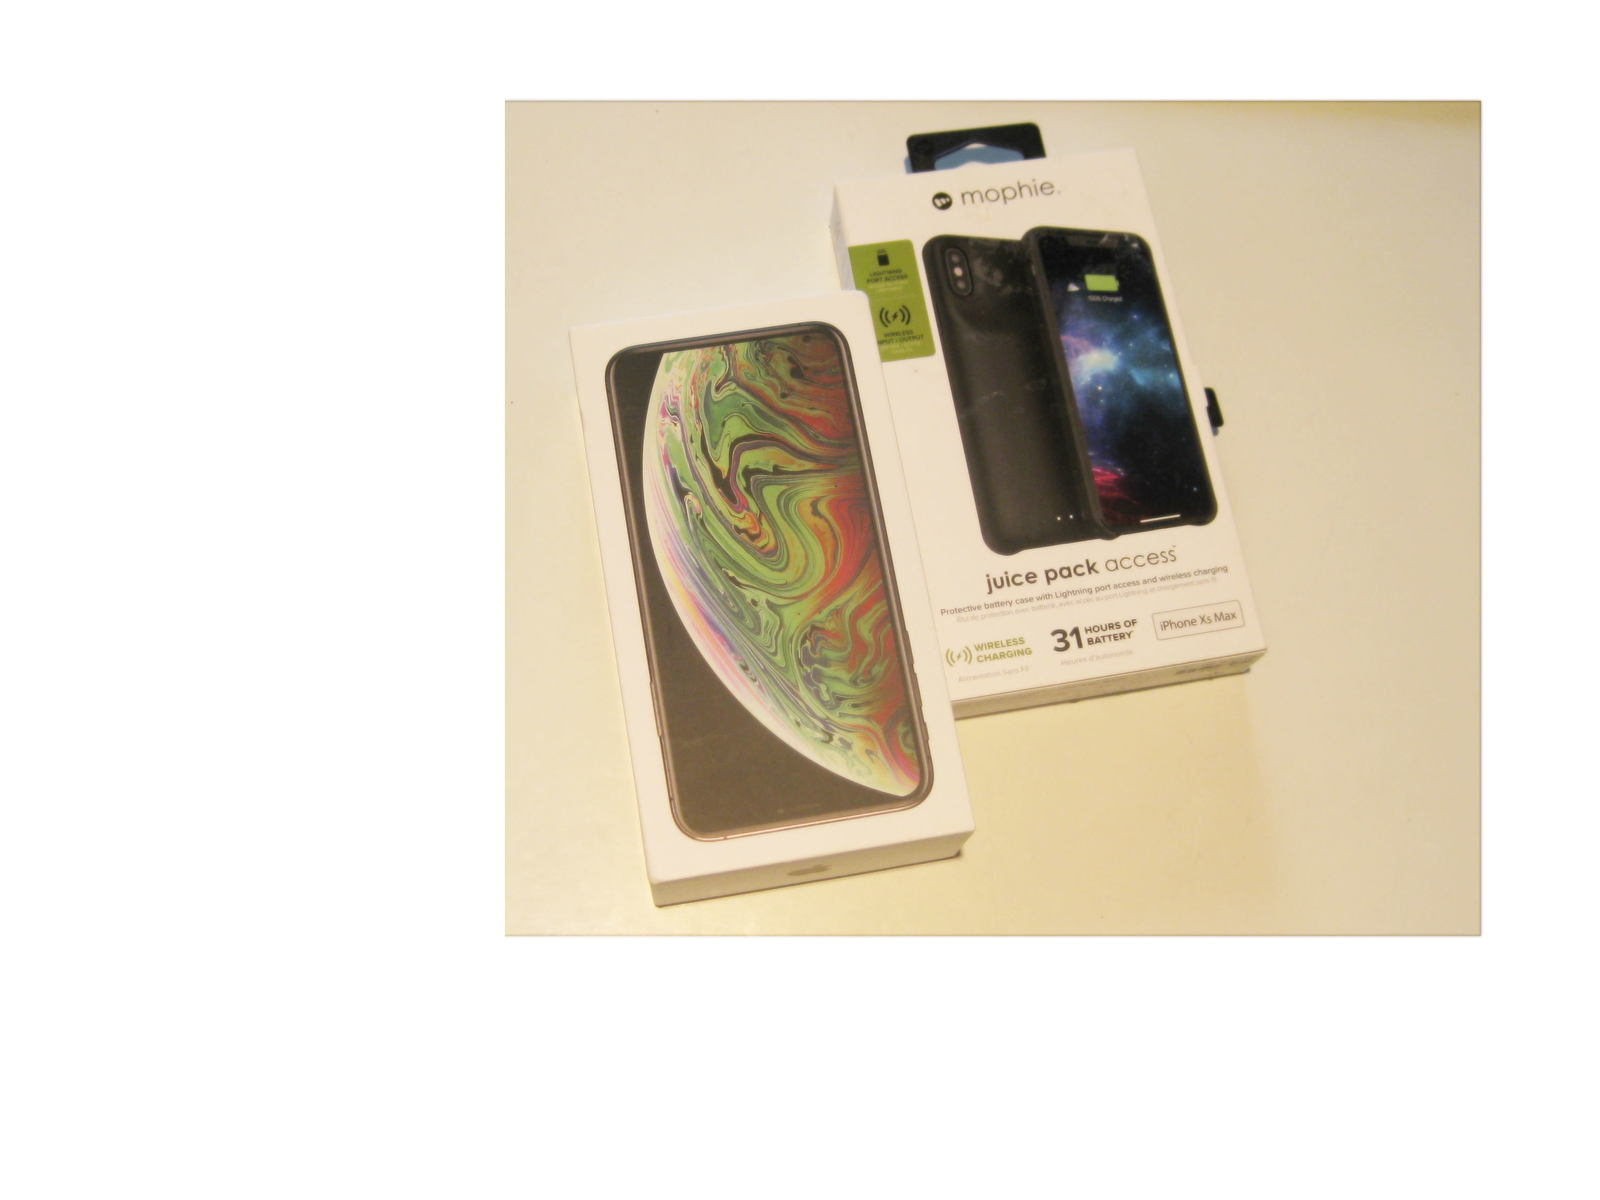 9/10 256gb  Unlocked A1921 Iphone Xs Max Bundle Deal! - $784.99